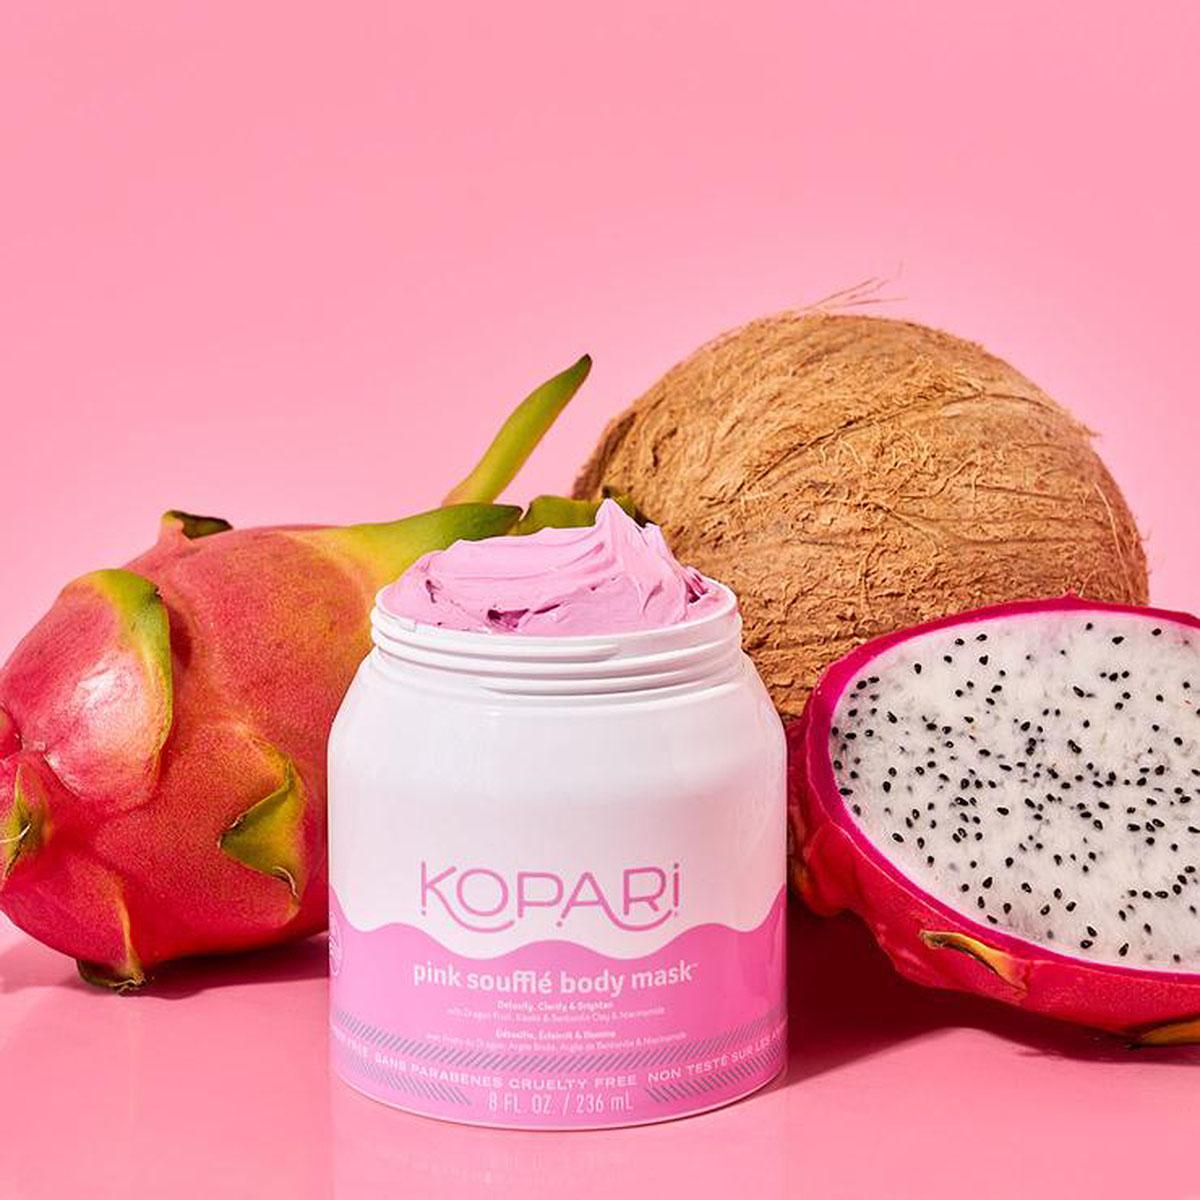 kopari-pink-souffle-mask-dragon-fruit